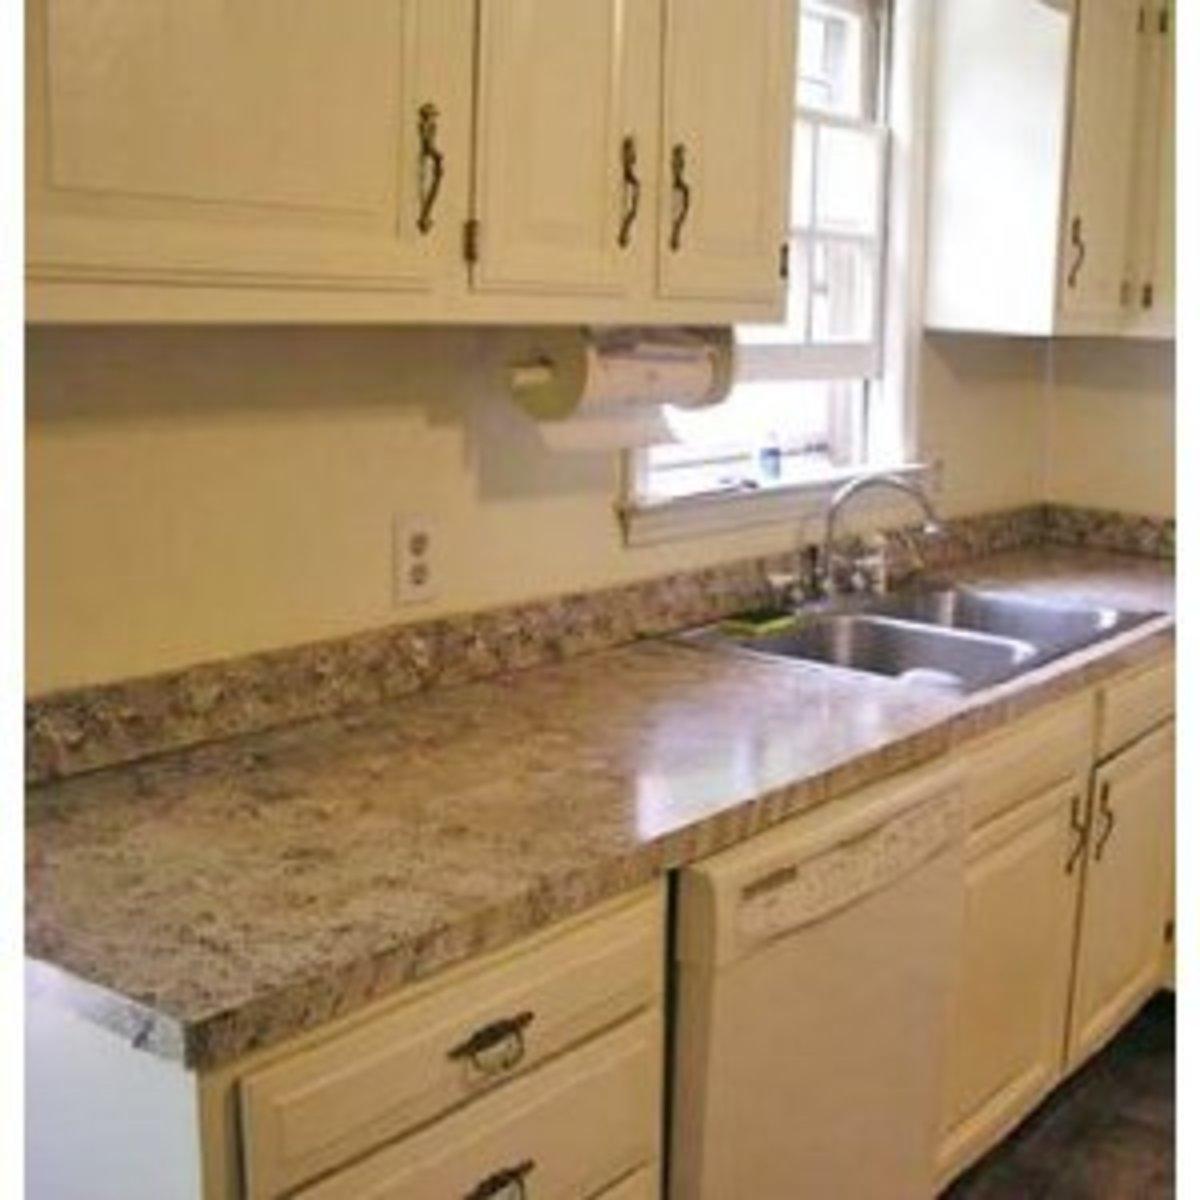 Giani Liquid Granite Sicilian Sand Faux Granite Countertop Paint Kit Kitchen Bath